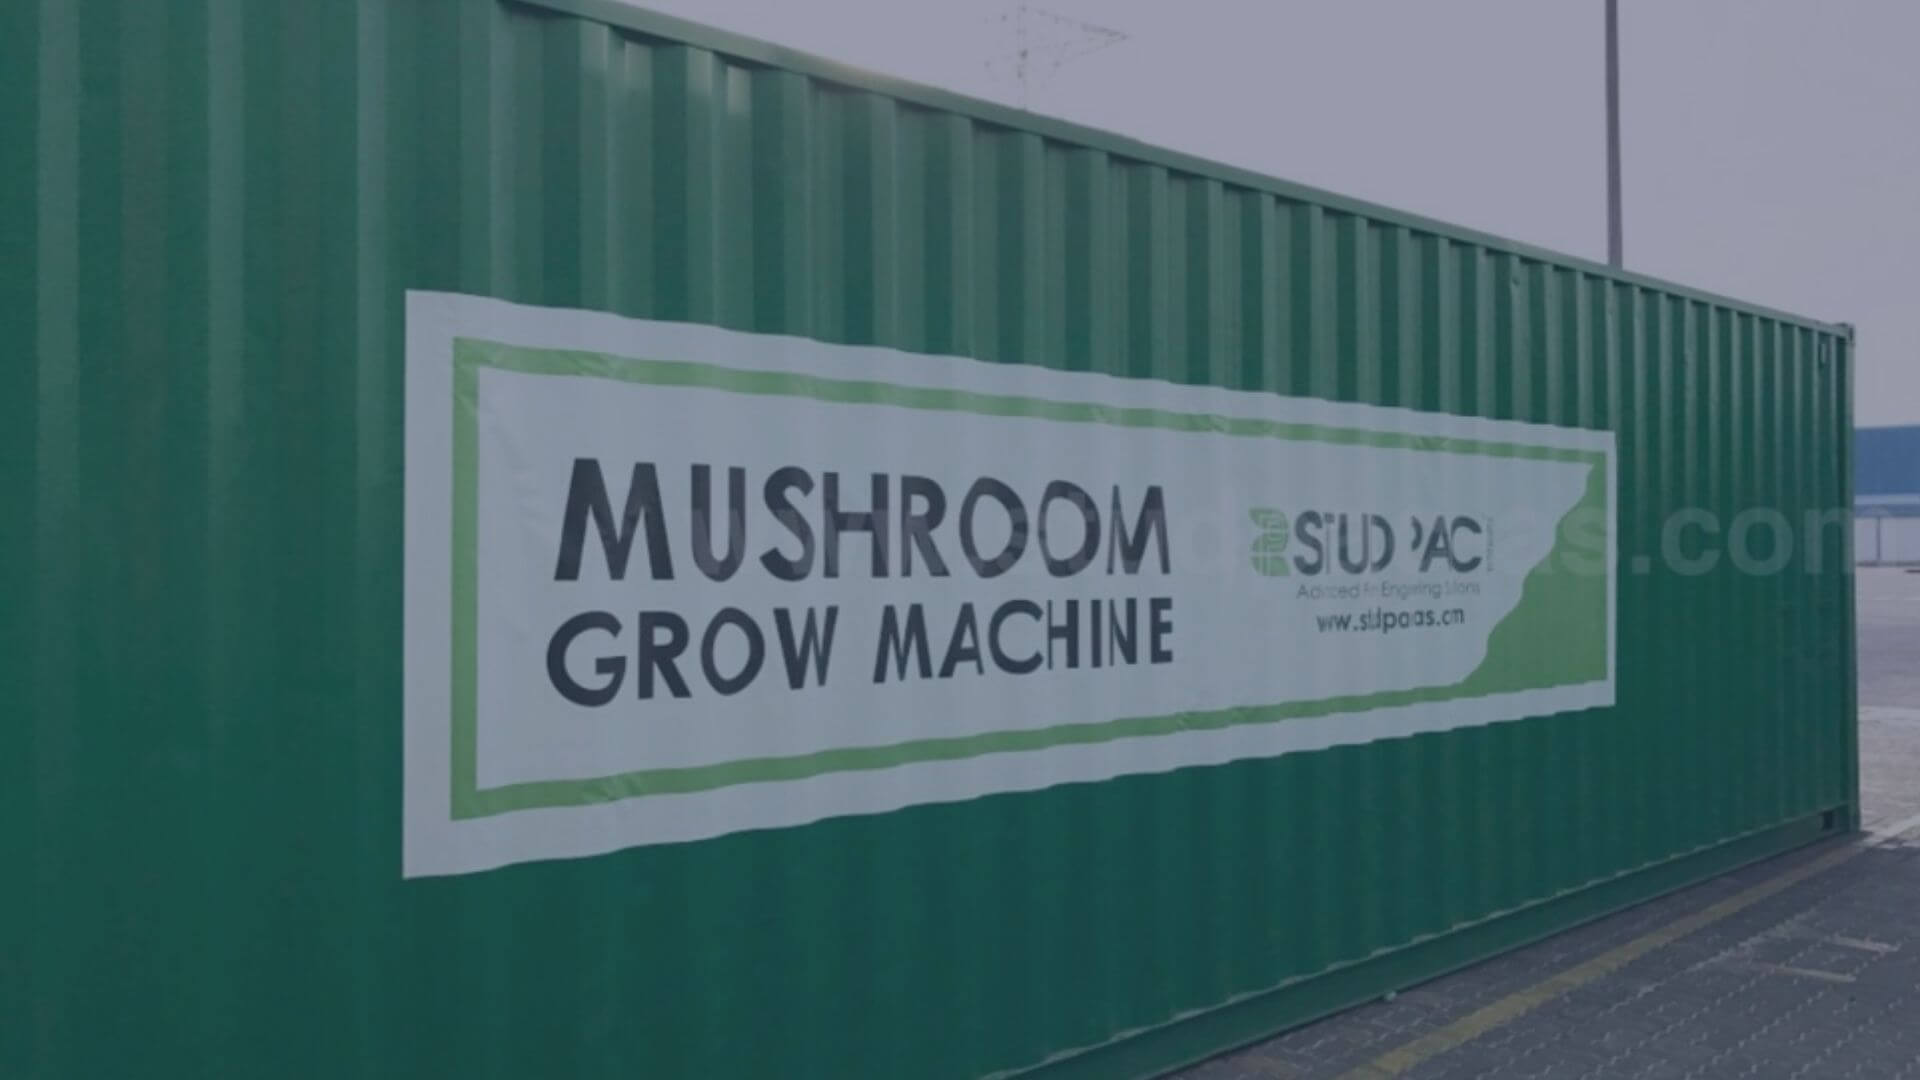 Mushroom Grow Machine - STUD PAC